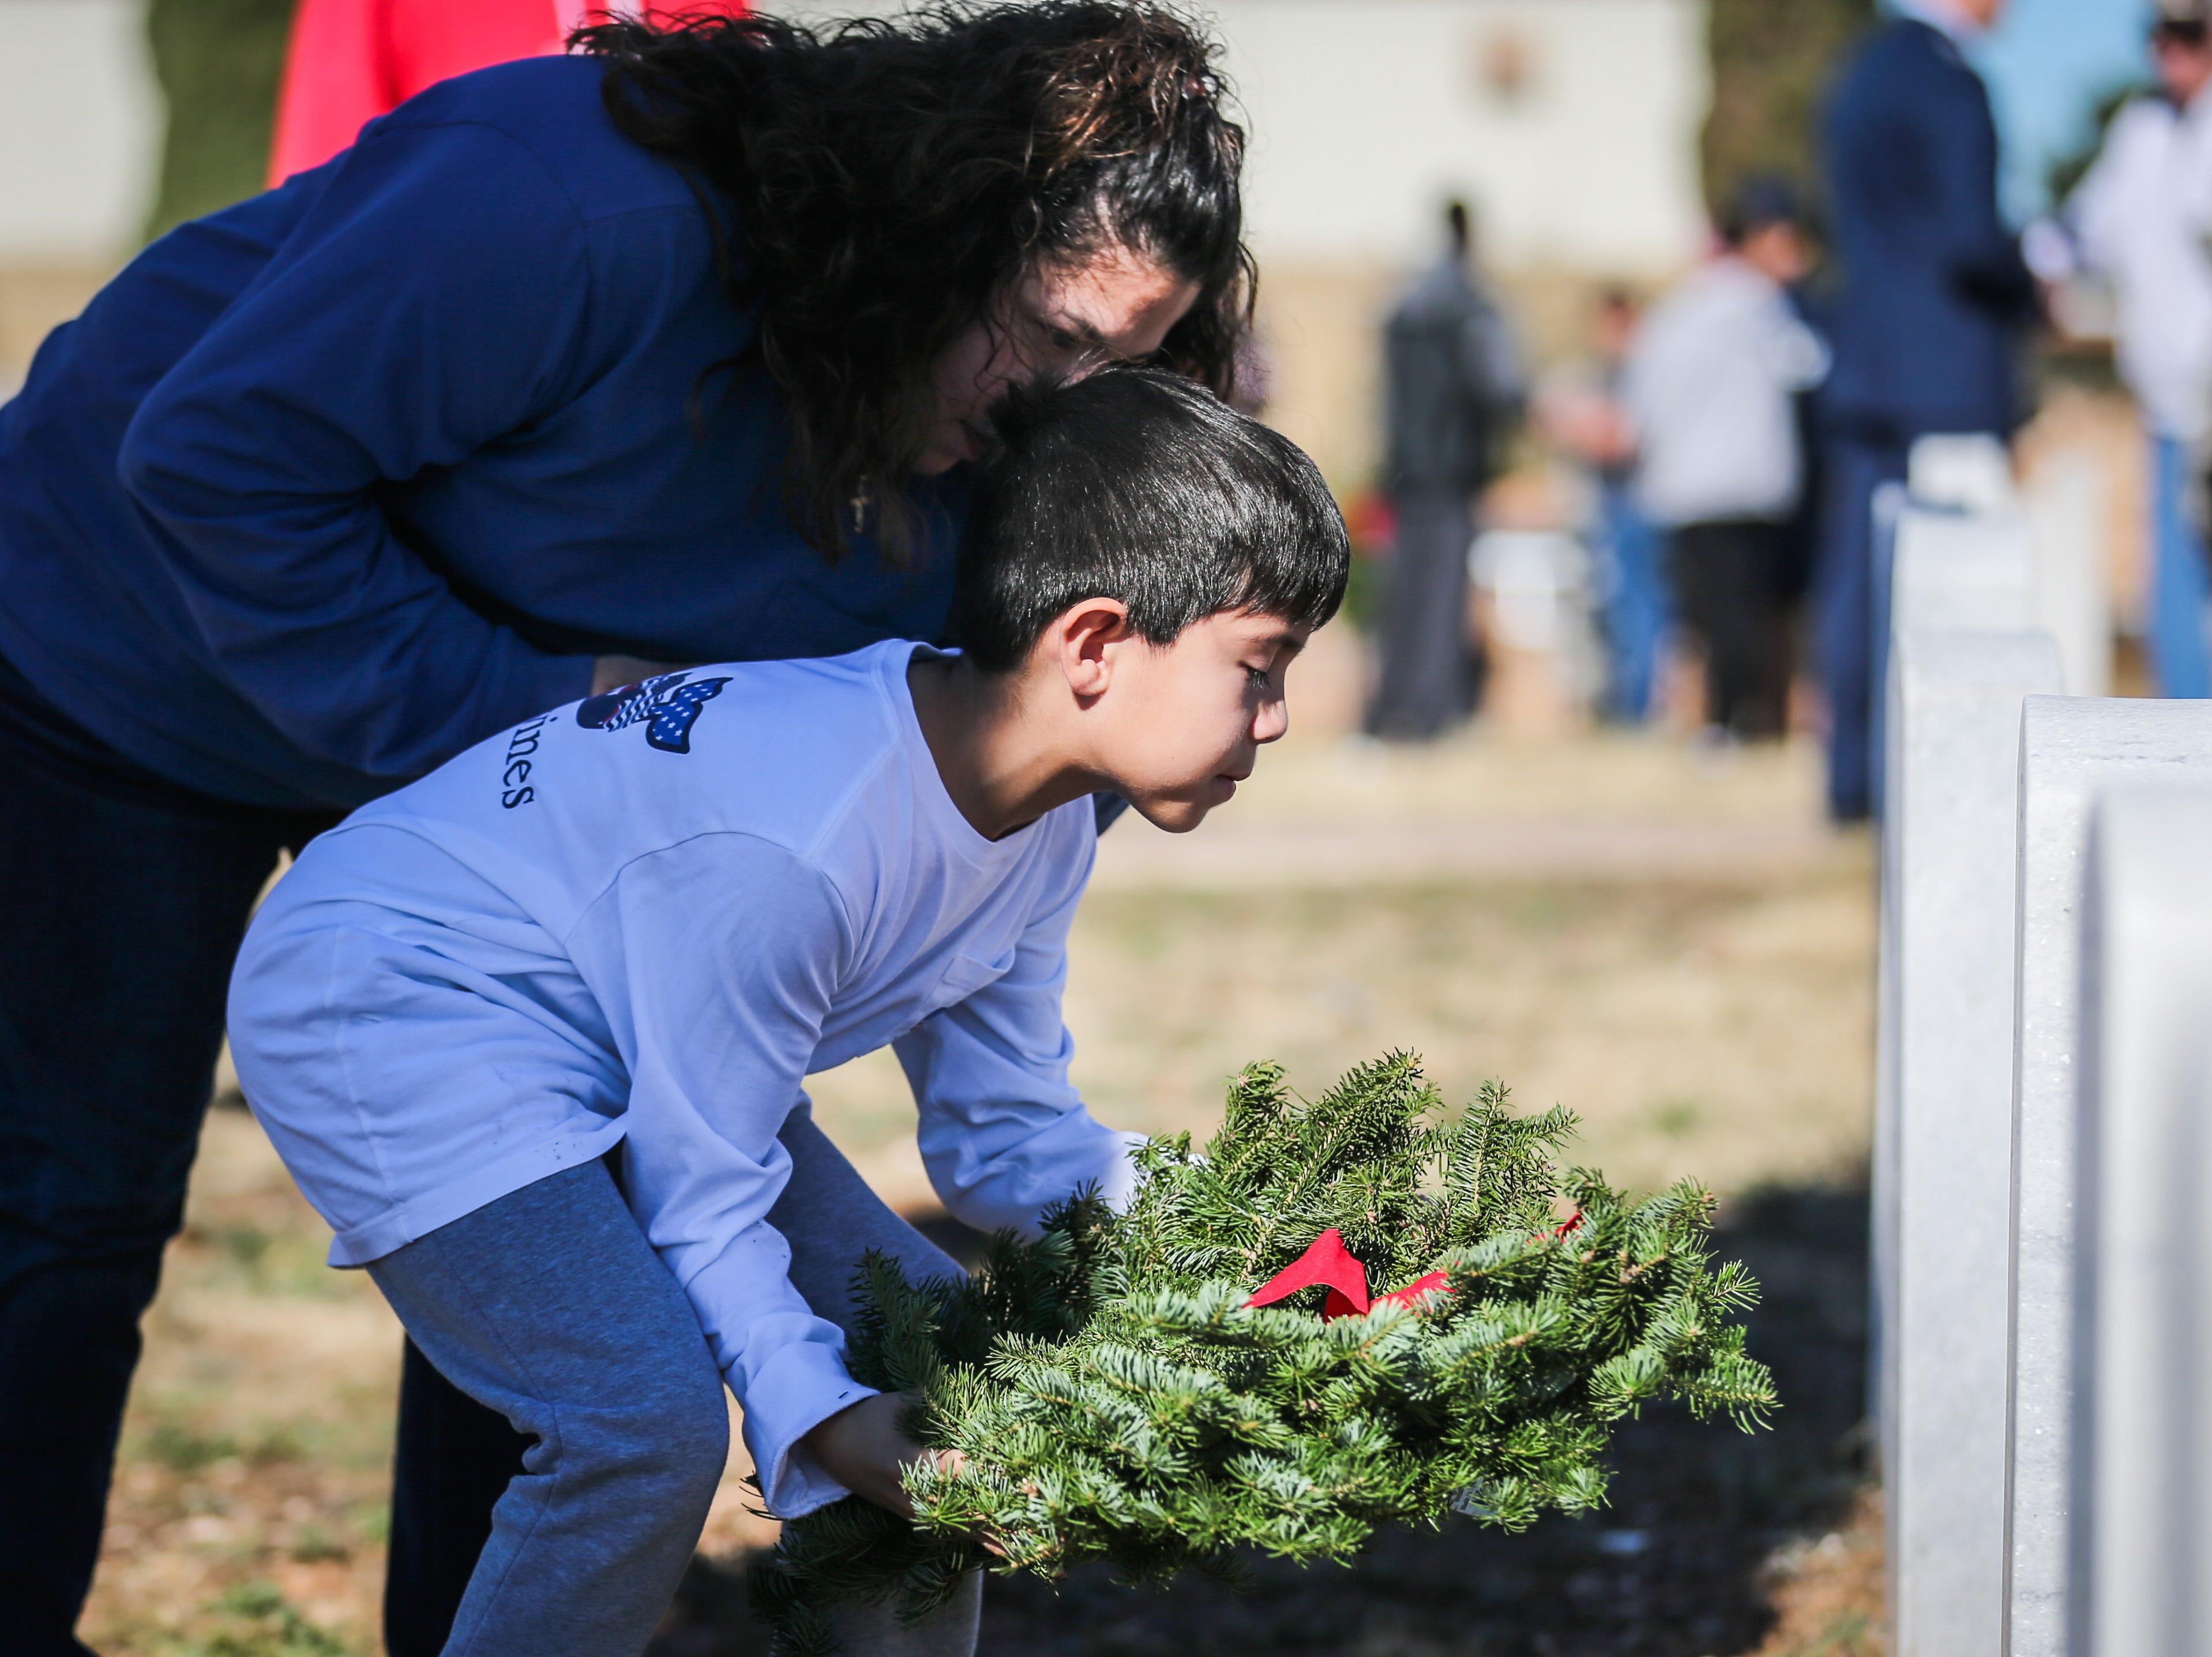 Daisy Seballes Ari Seballes, 8, place a wreath on a grave during Wreaths Across America Saturday, Dec. 15, 2018, at Belvedere Memorial Park.